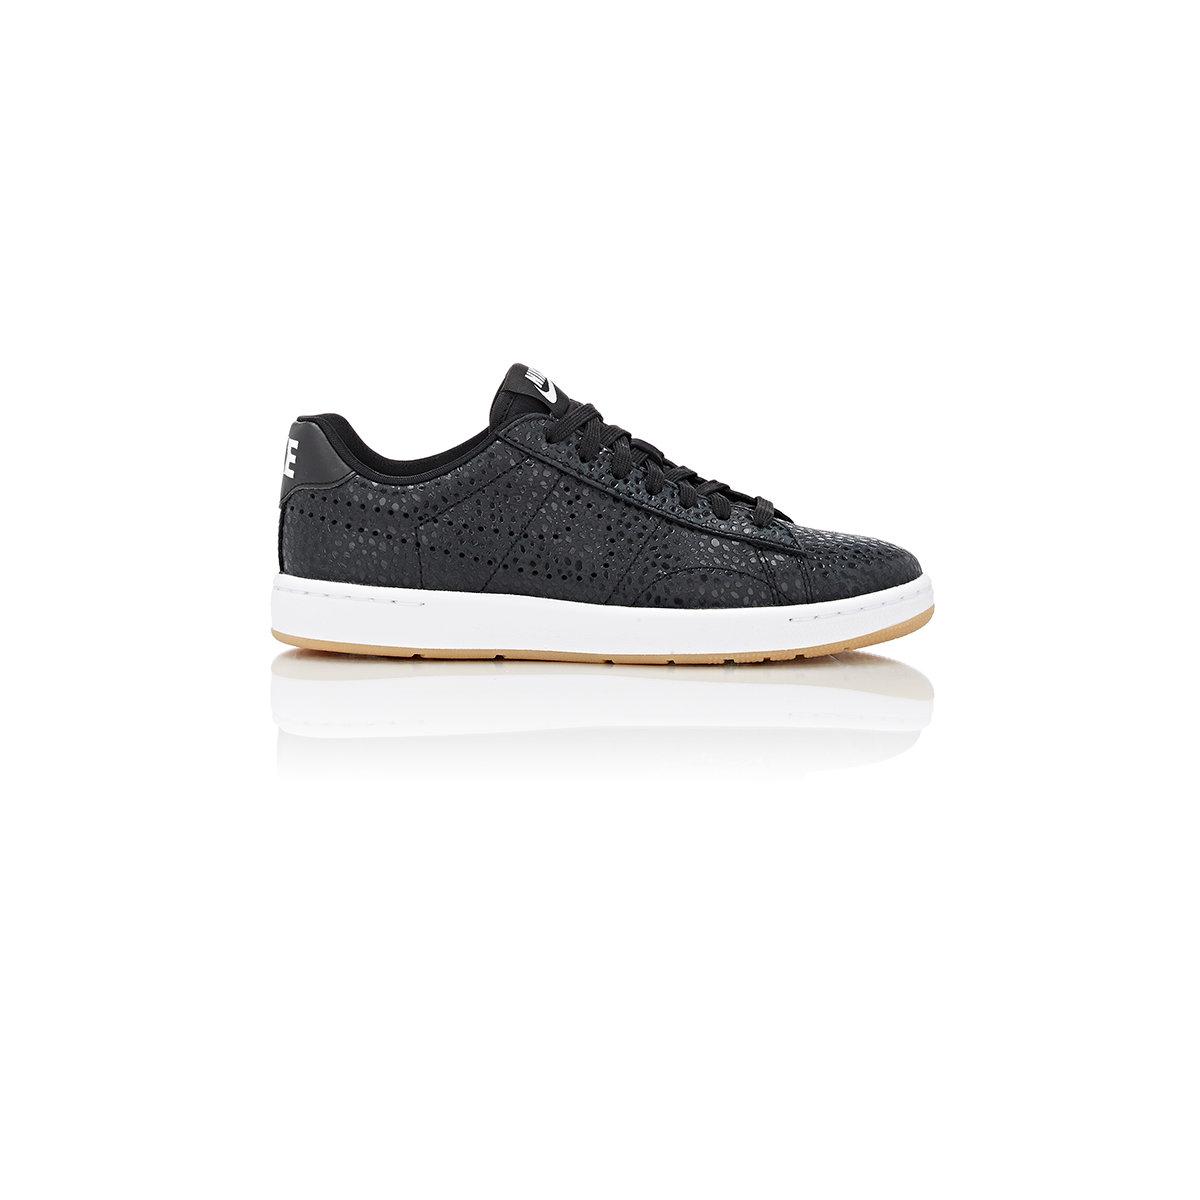 nike tennis classic ultra premium sneakers in black lyst. Black Bedroom Furniture Sets. Home Design Ideas